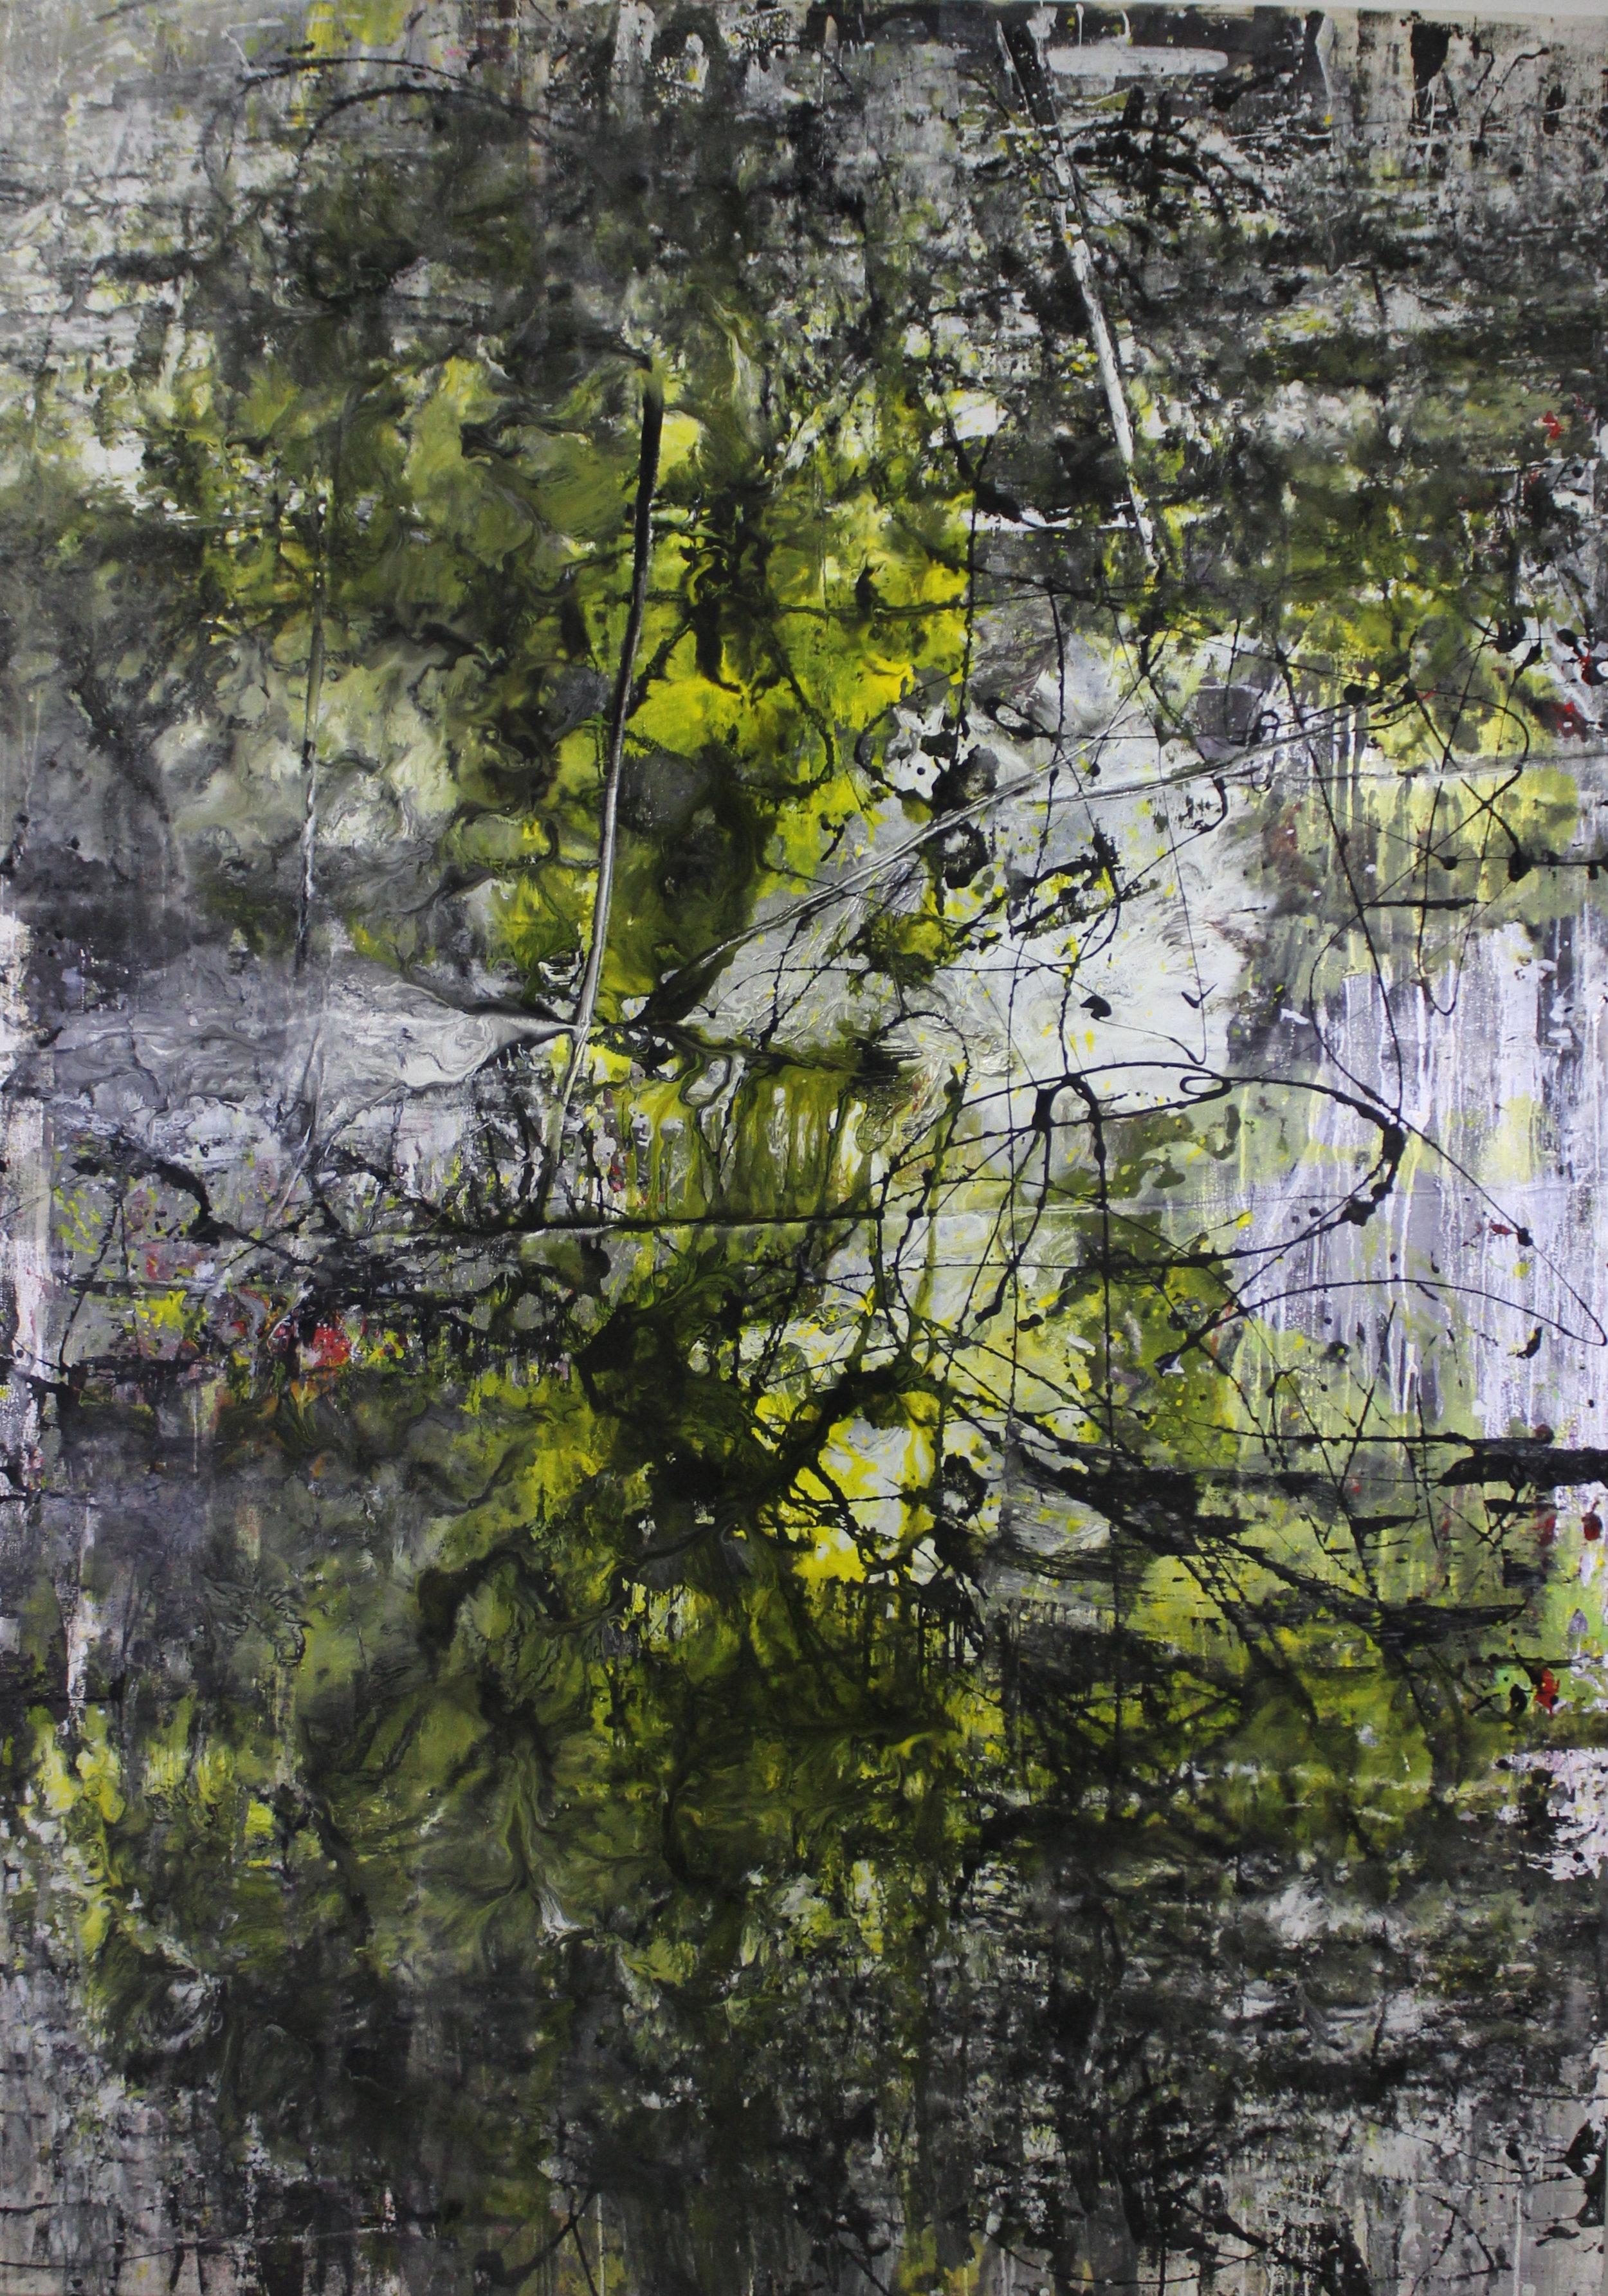 Untitled, 2013, enamel paint on canvas, 122 x 183 cm